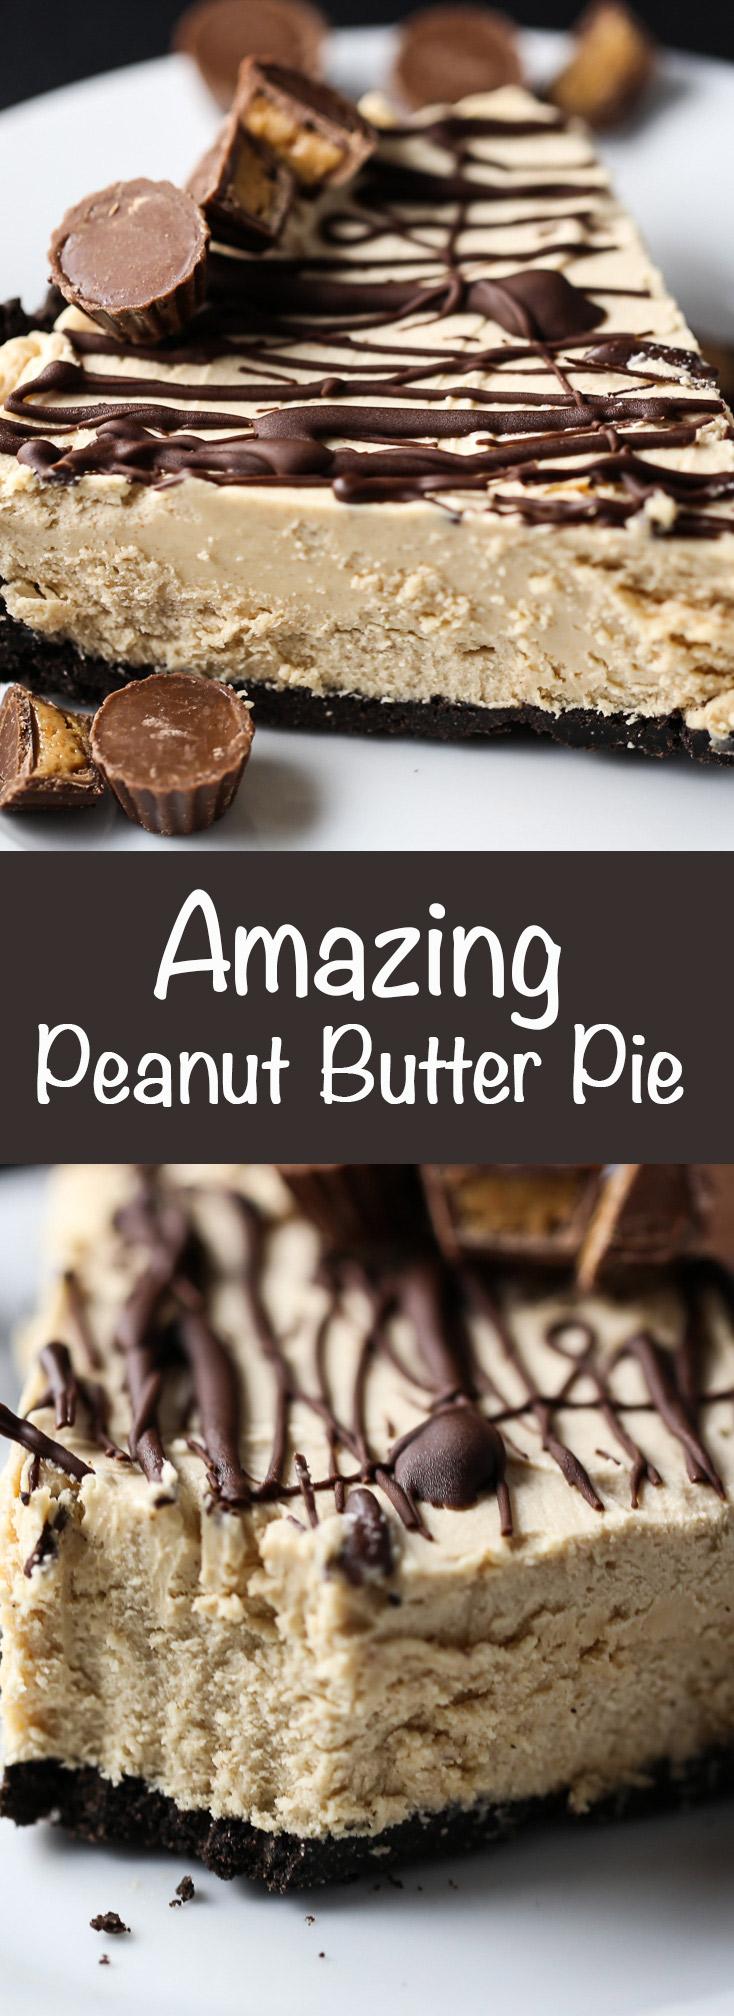 Amazing Peanut Butter Pie